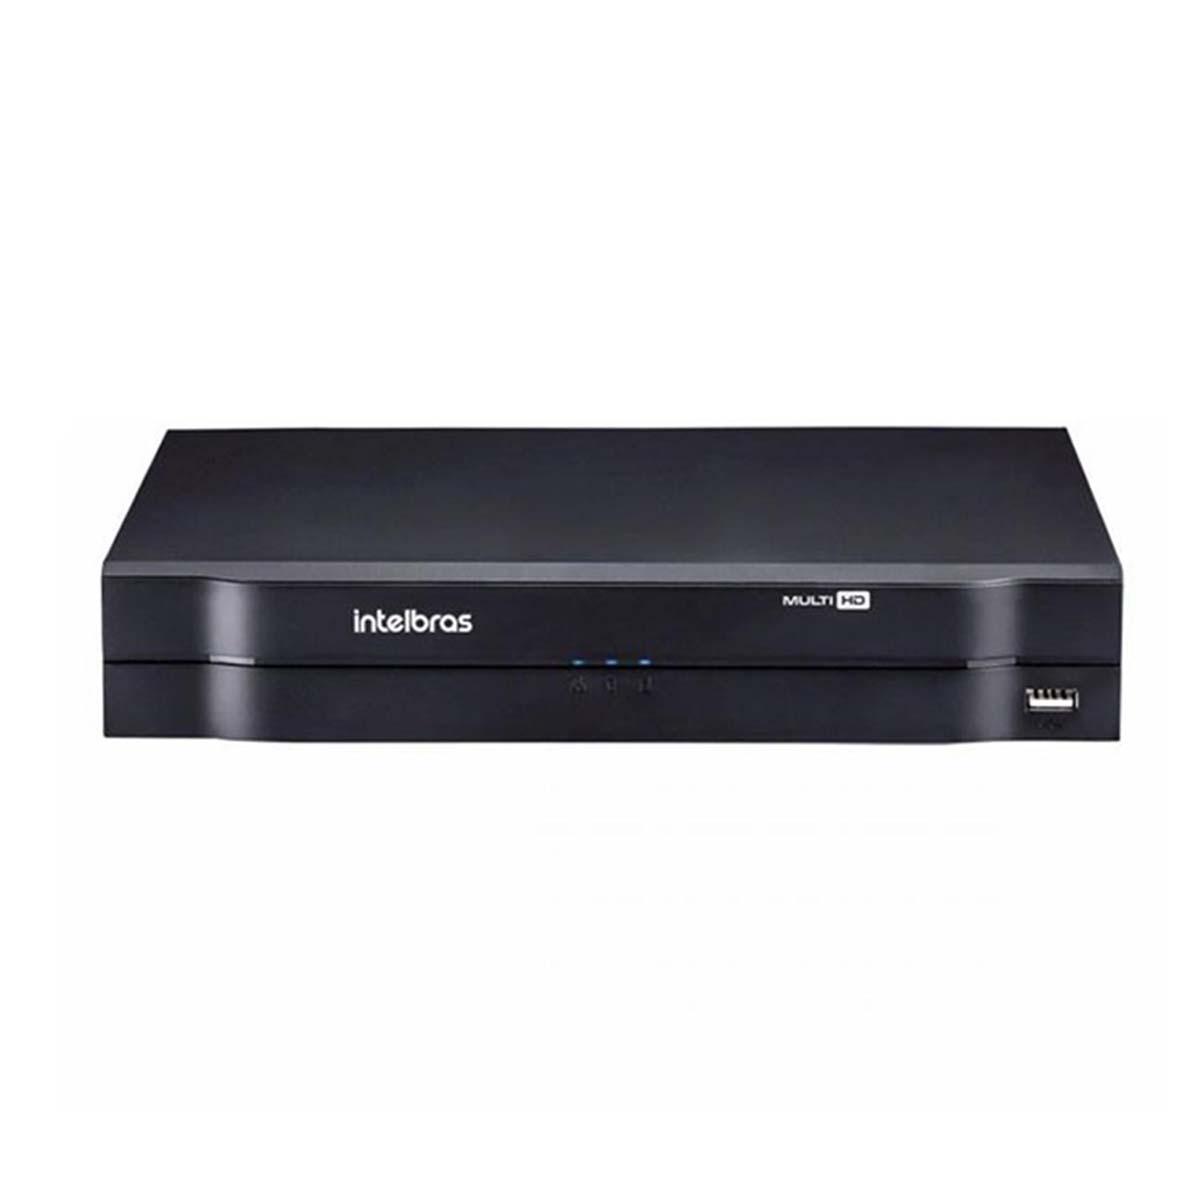 Kit CFTV 02 Câmeras VHD 1120 B G6 + MHDX 1108 S/ HD + Acessórios